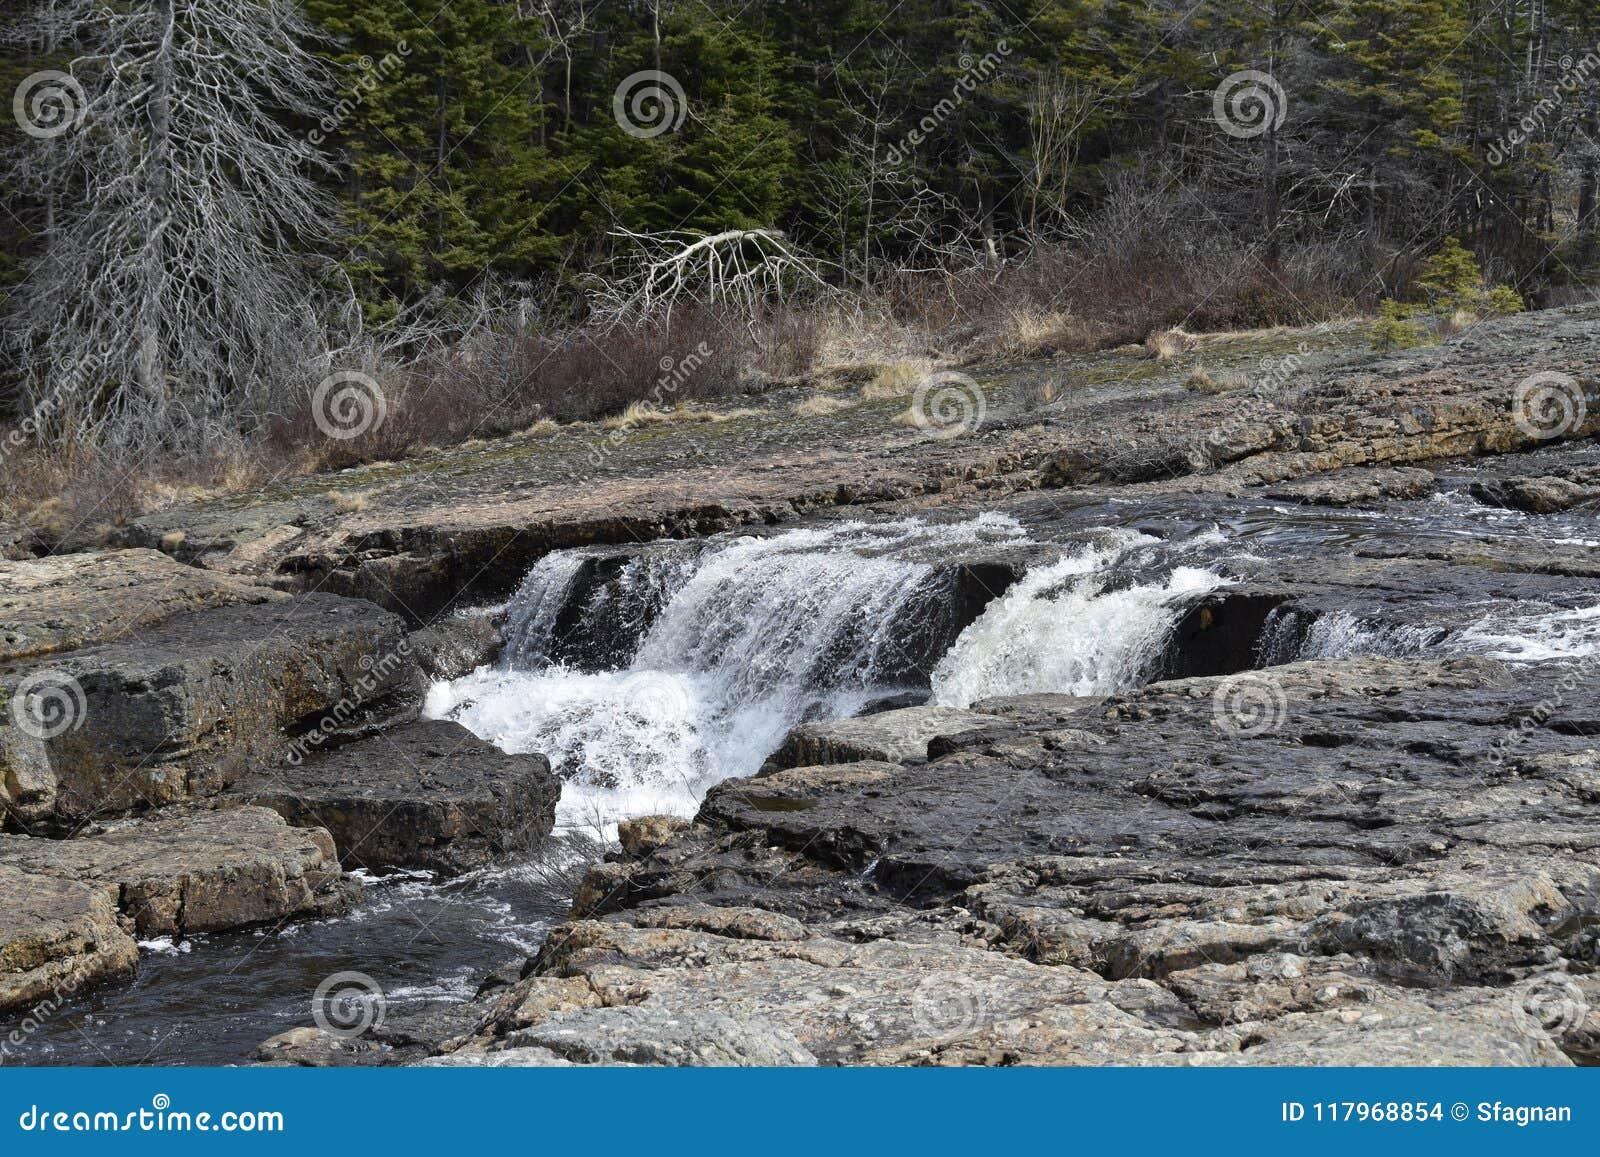 Manuels River scenic landscape in Spring